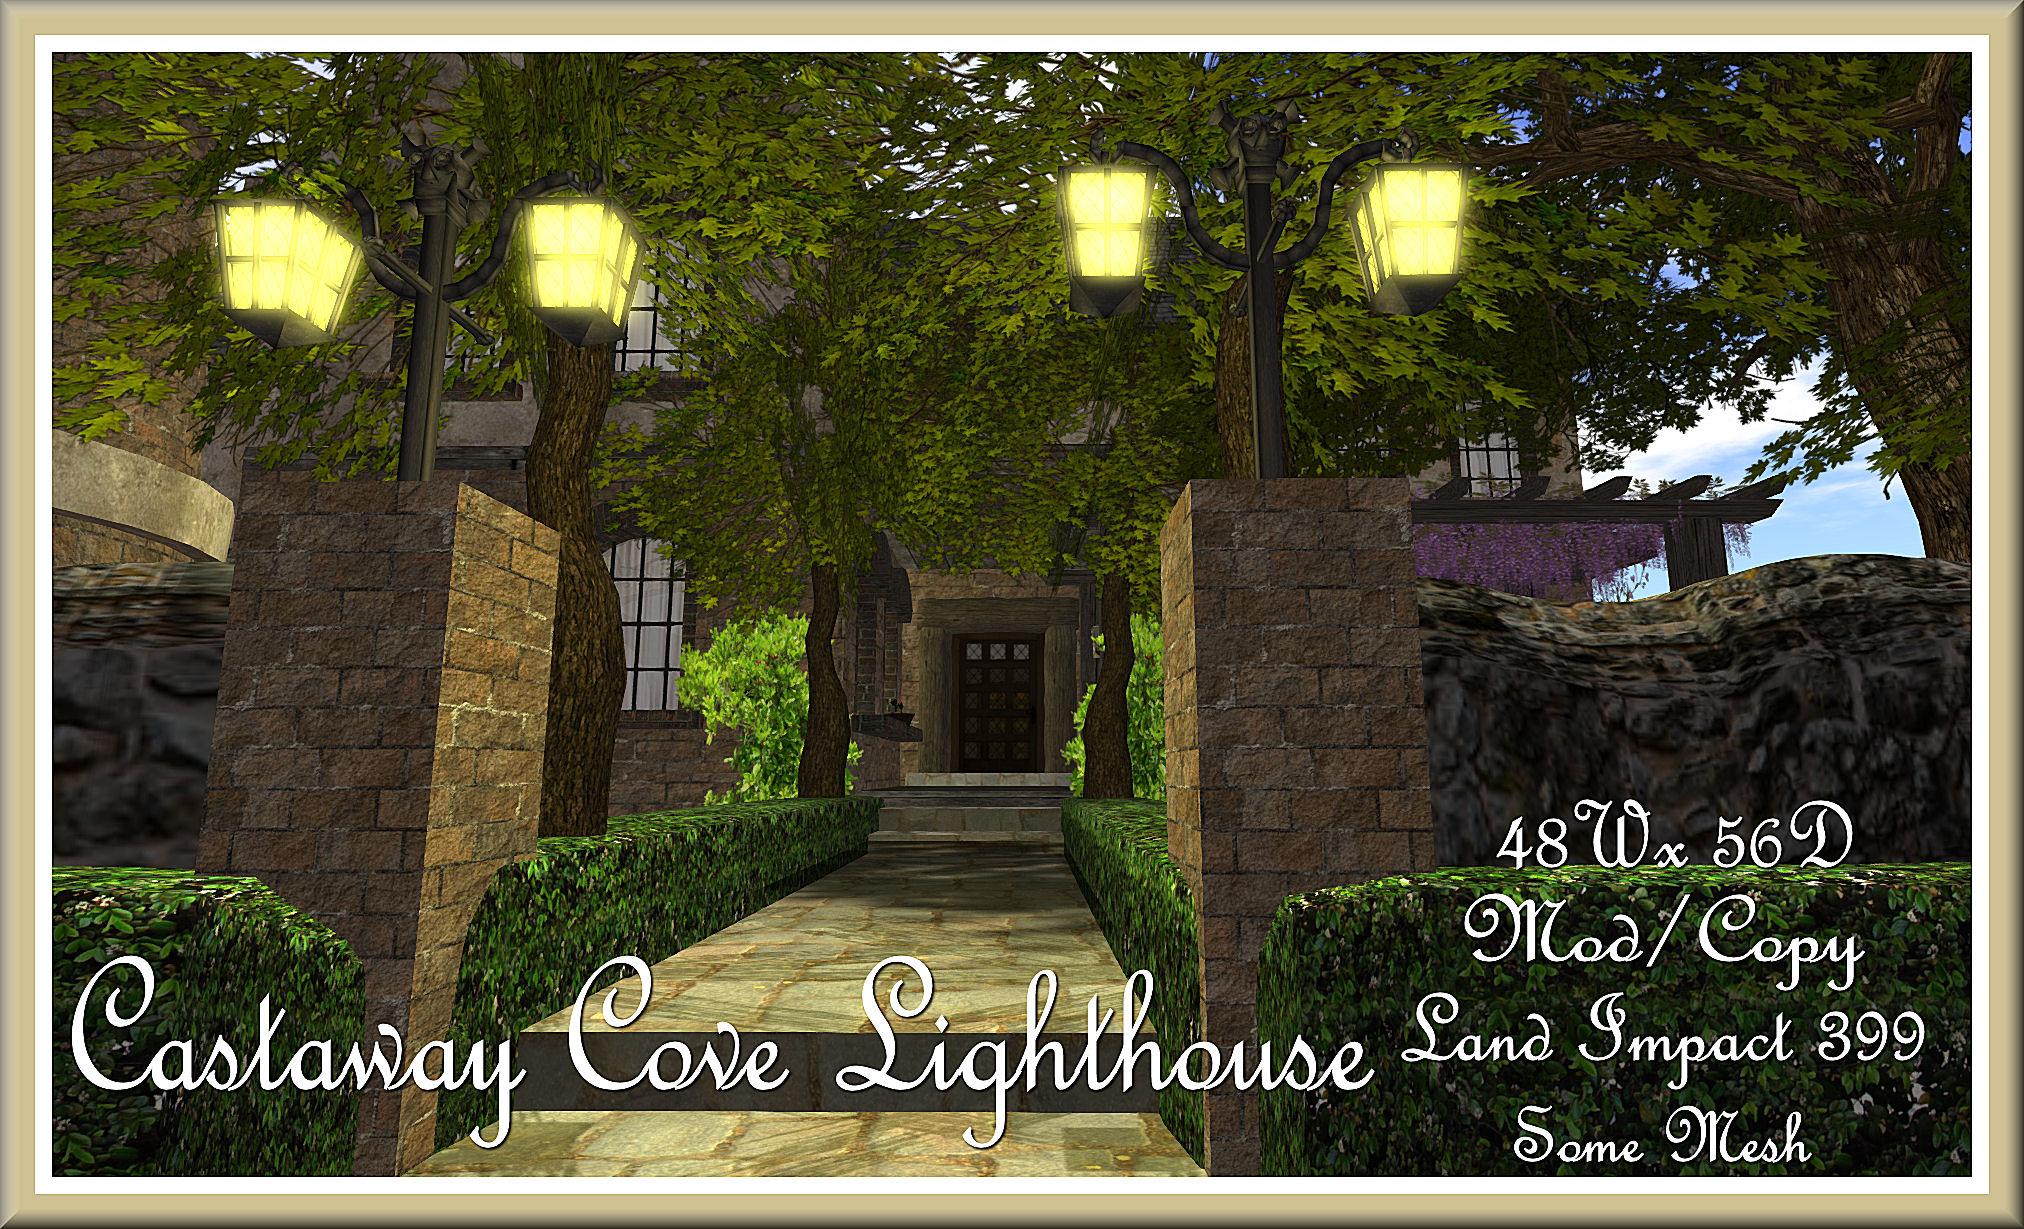 Castaway Cove Lighthouse.jpg